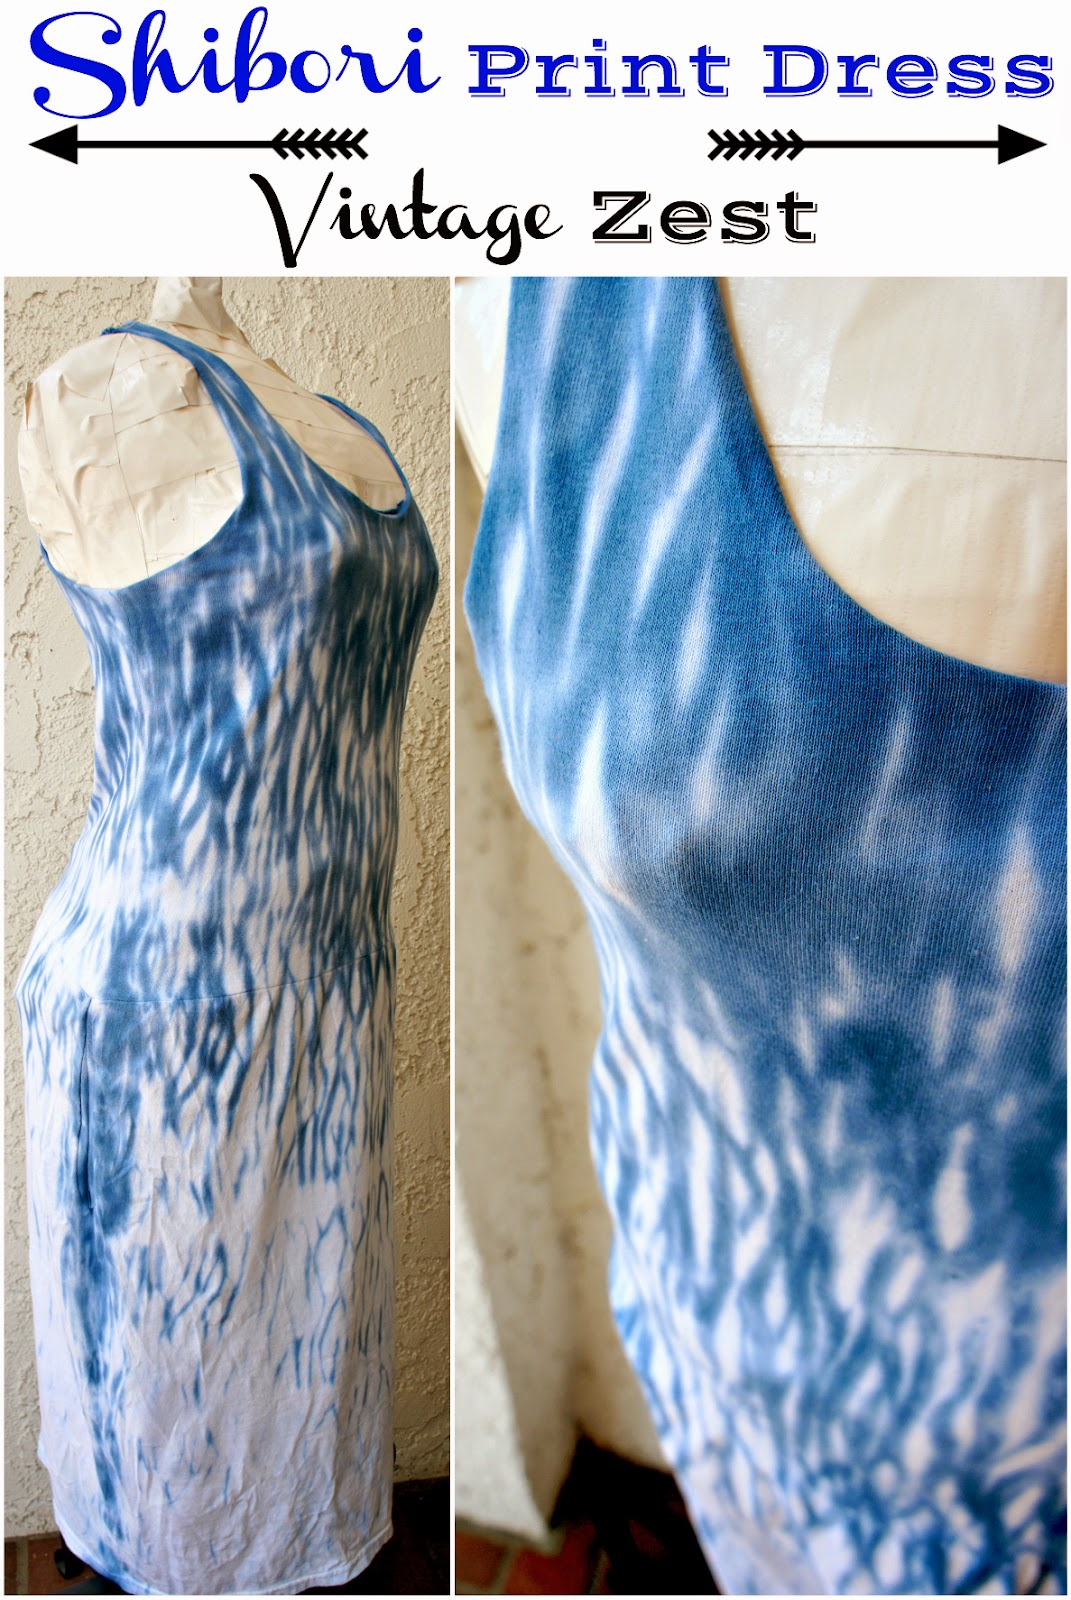 Shibori Print Dress on Diane's Vintage Zest!